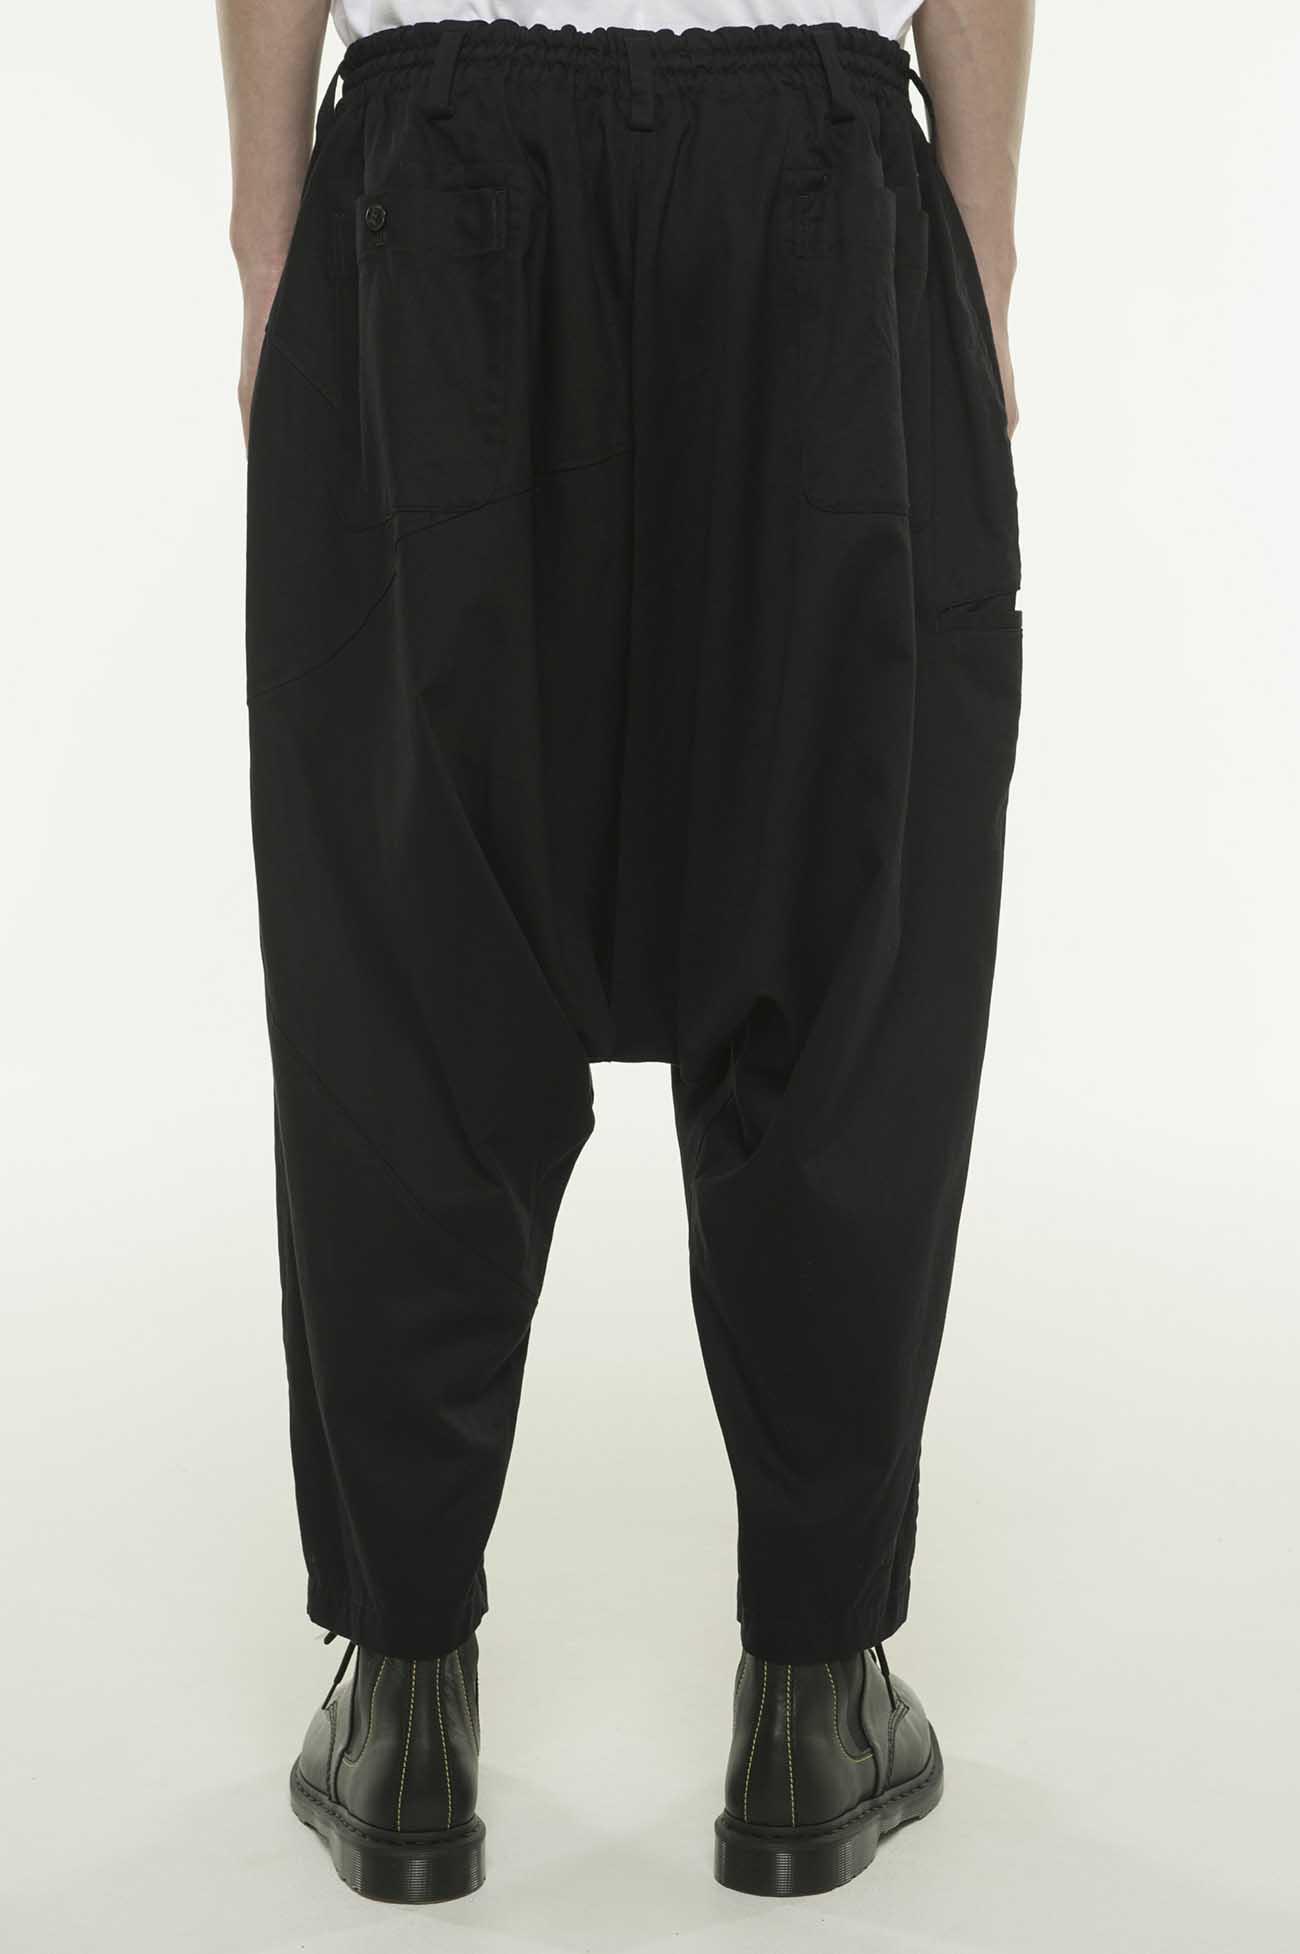 20/Cotton Twill Geometry Switching Sarouel Pants